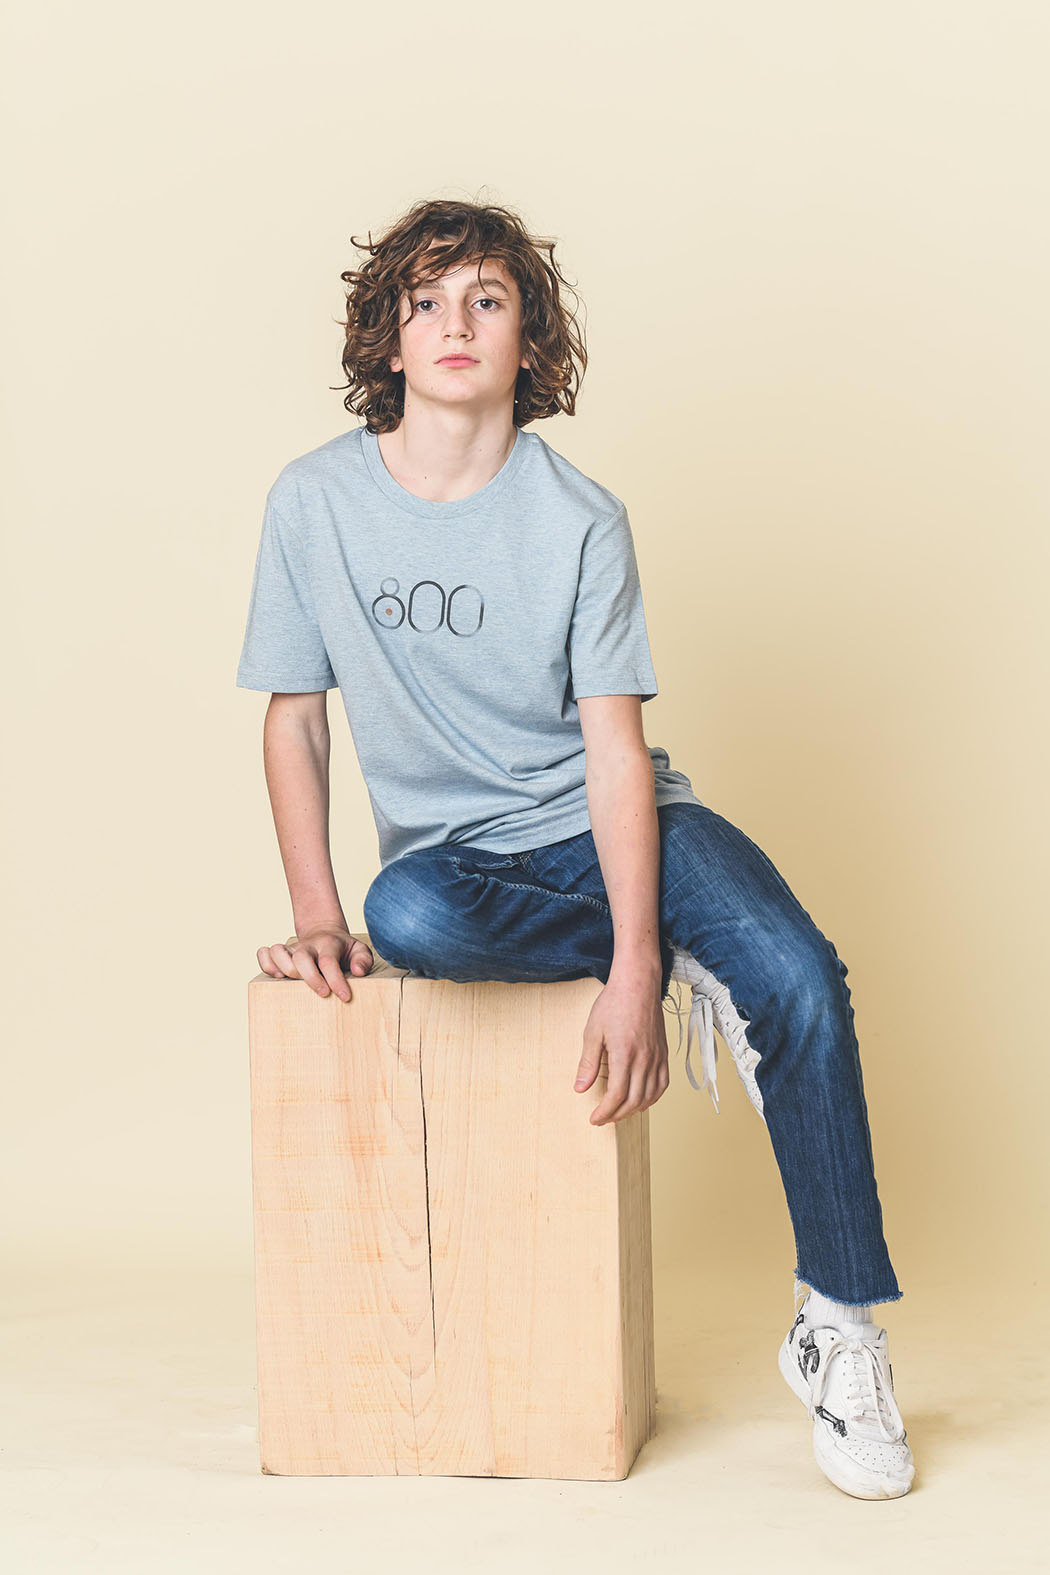 Laurent-scavone-photographe-mode-studio-lille-120